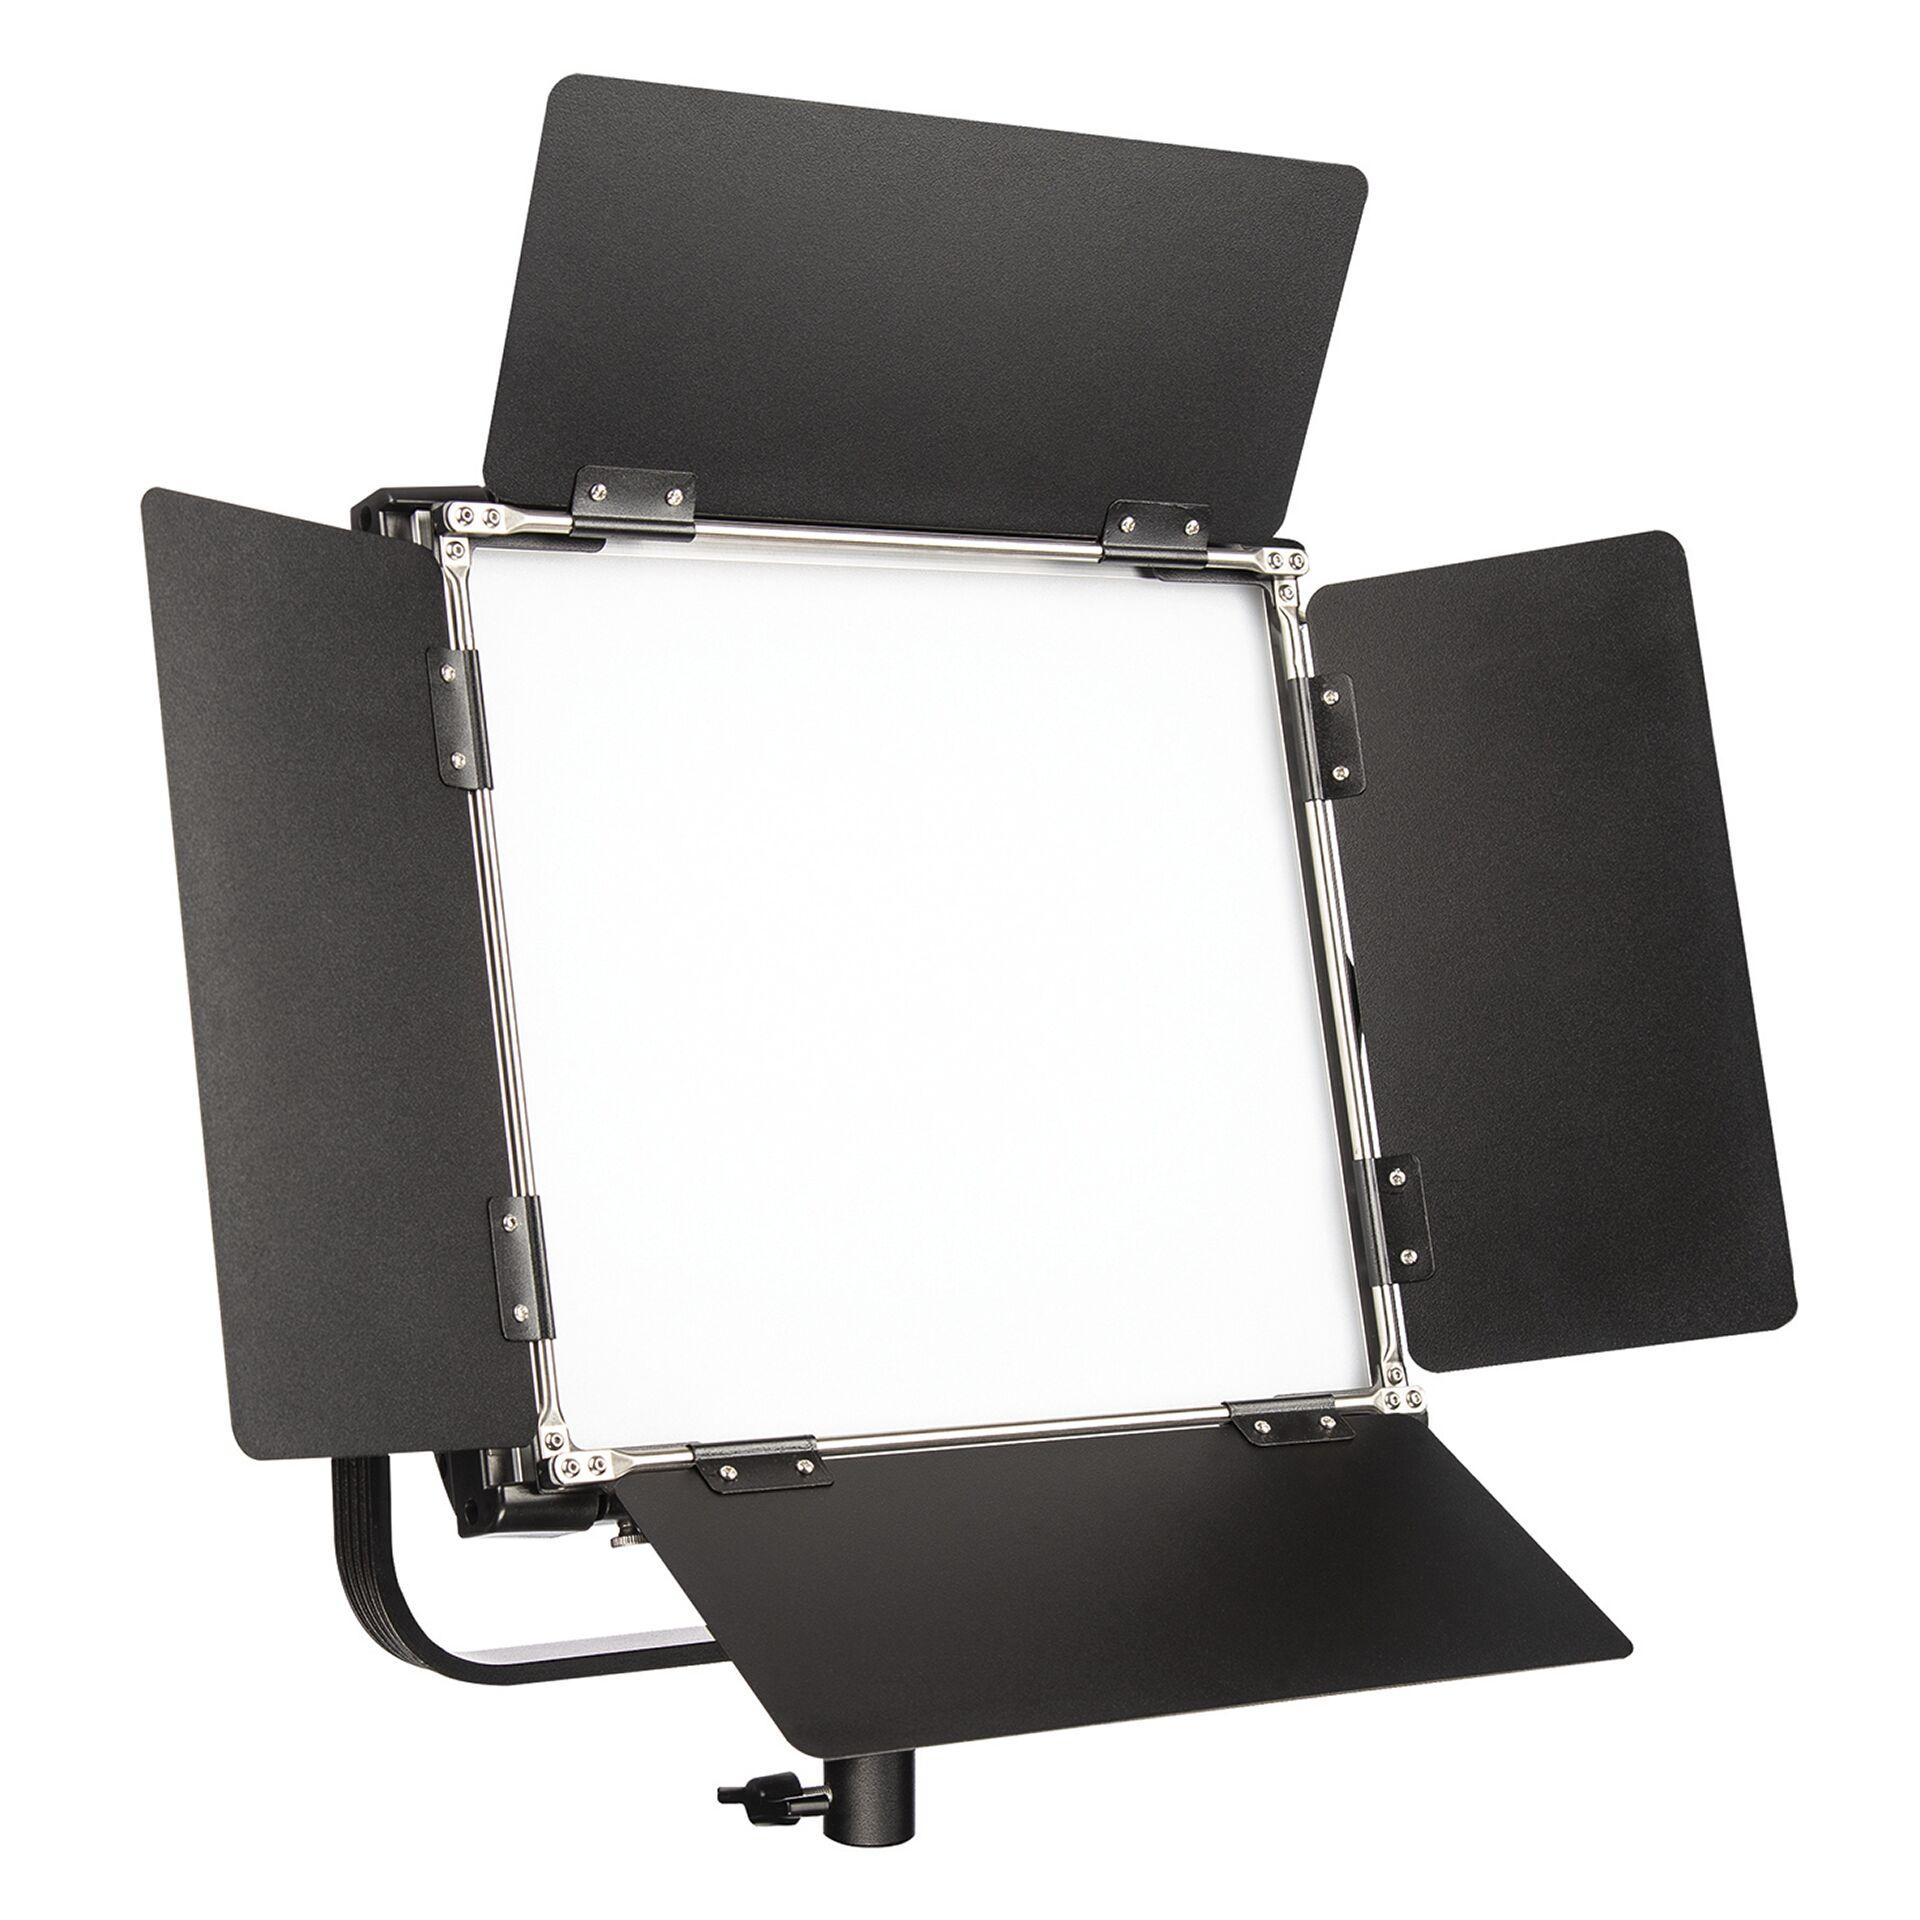 Walimex Pro Rainbow LED RGBWW Fluorescent Light 50W